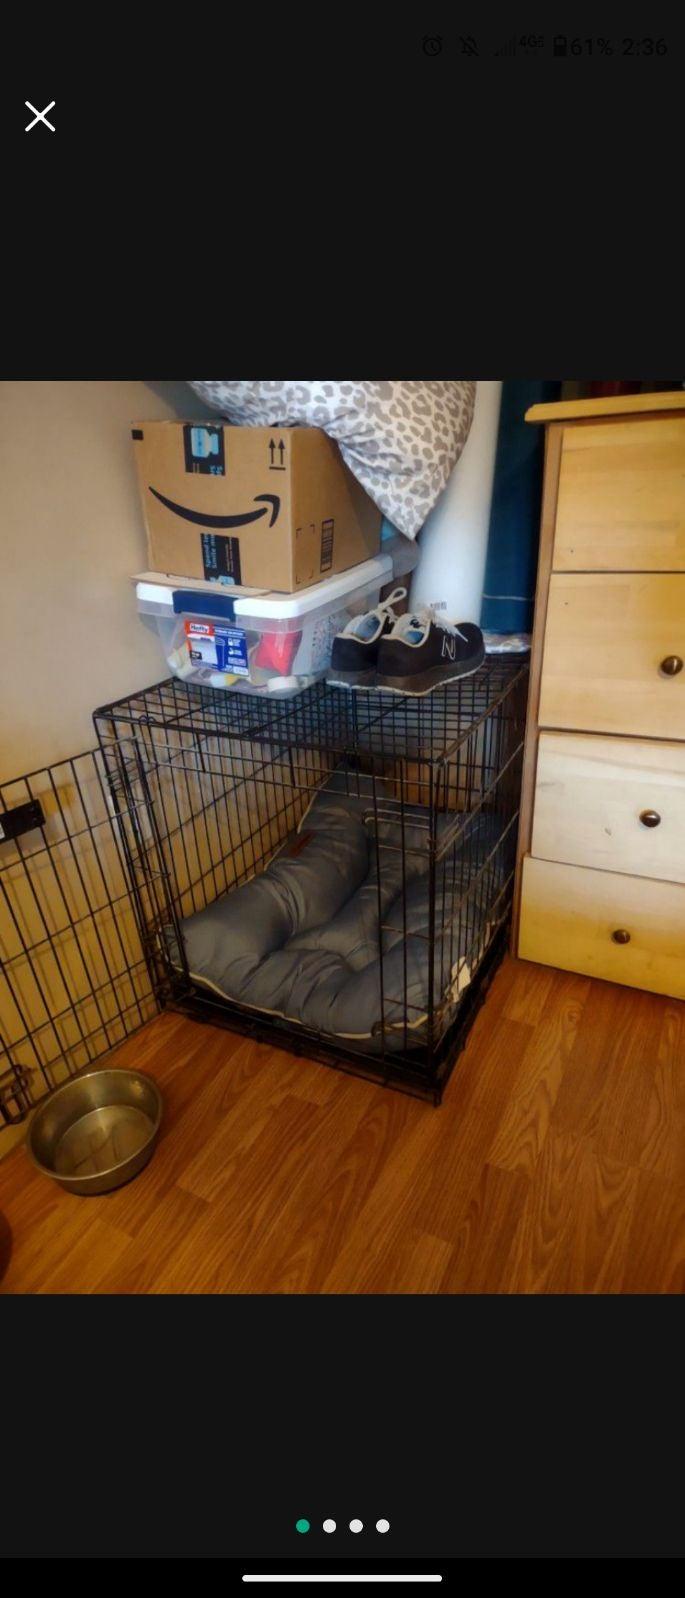 Medium Sized Dog Crate